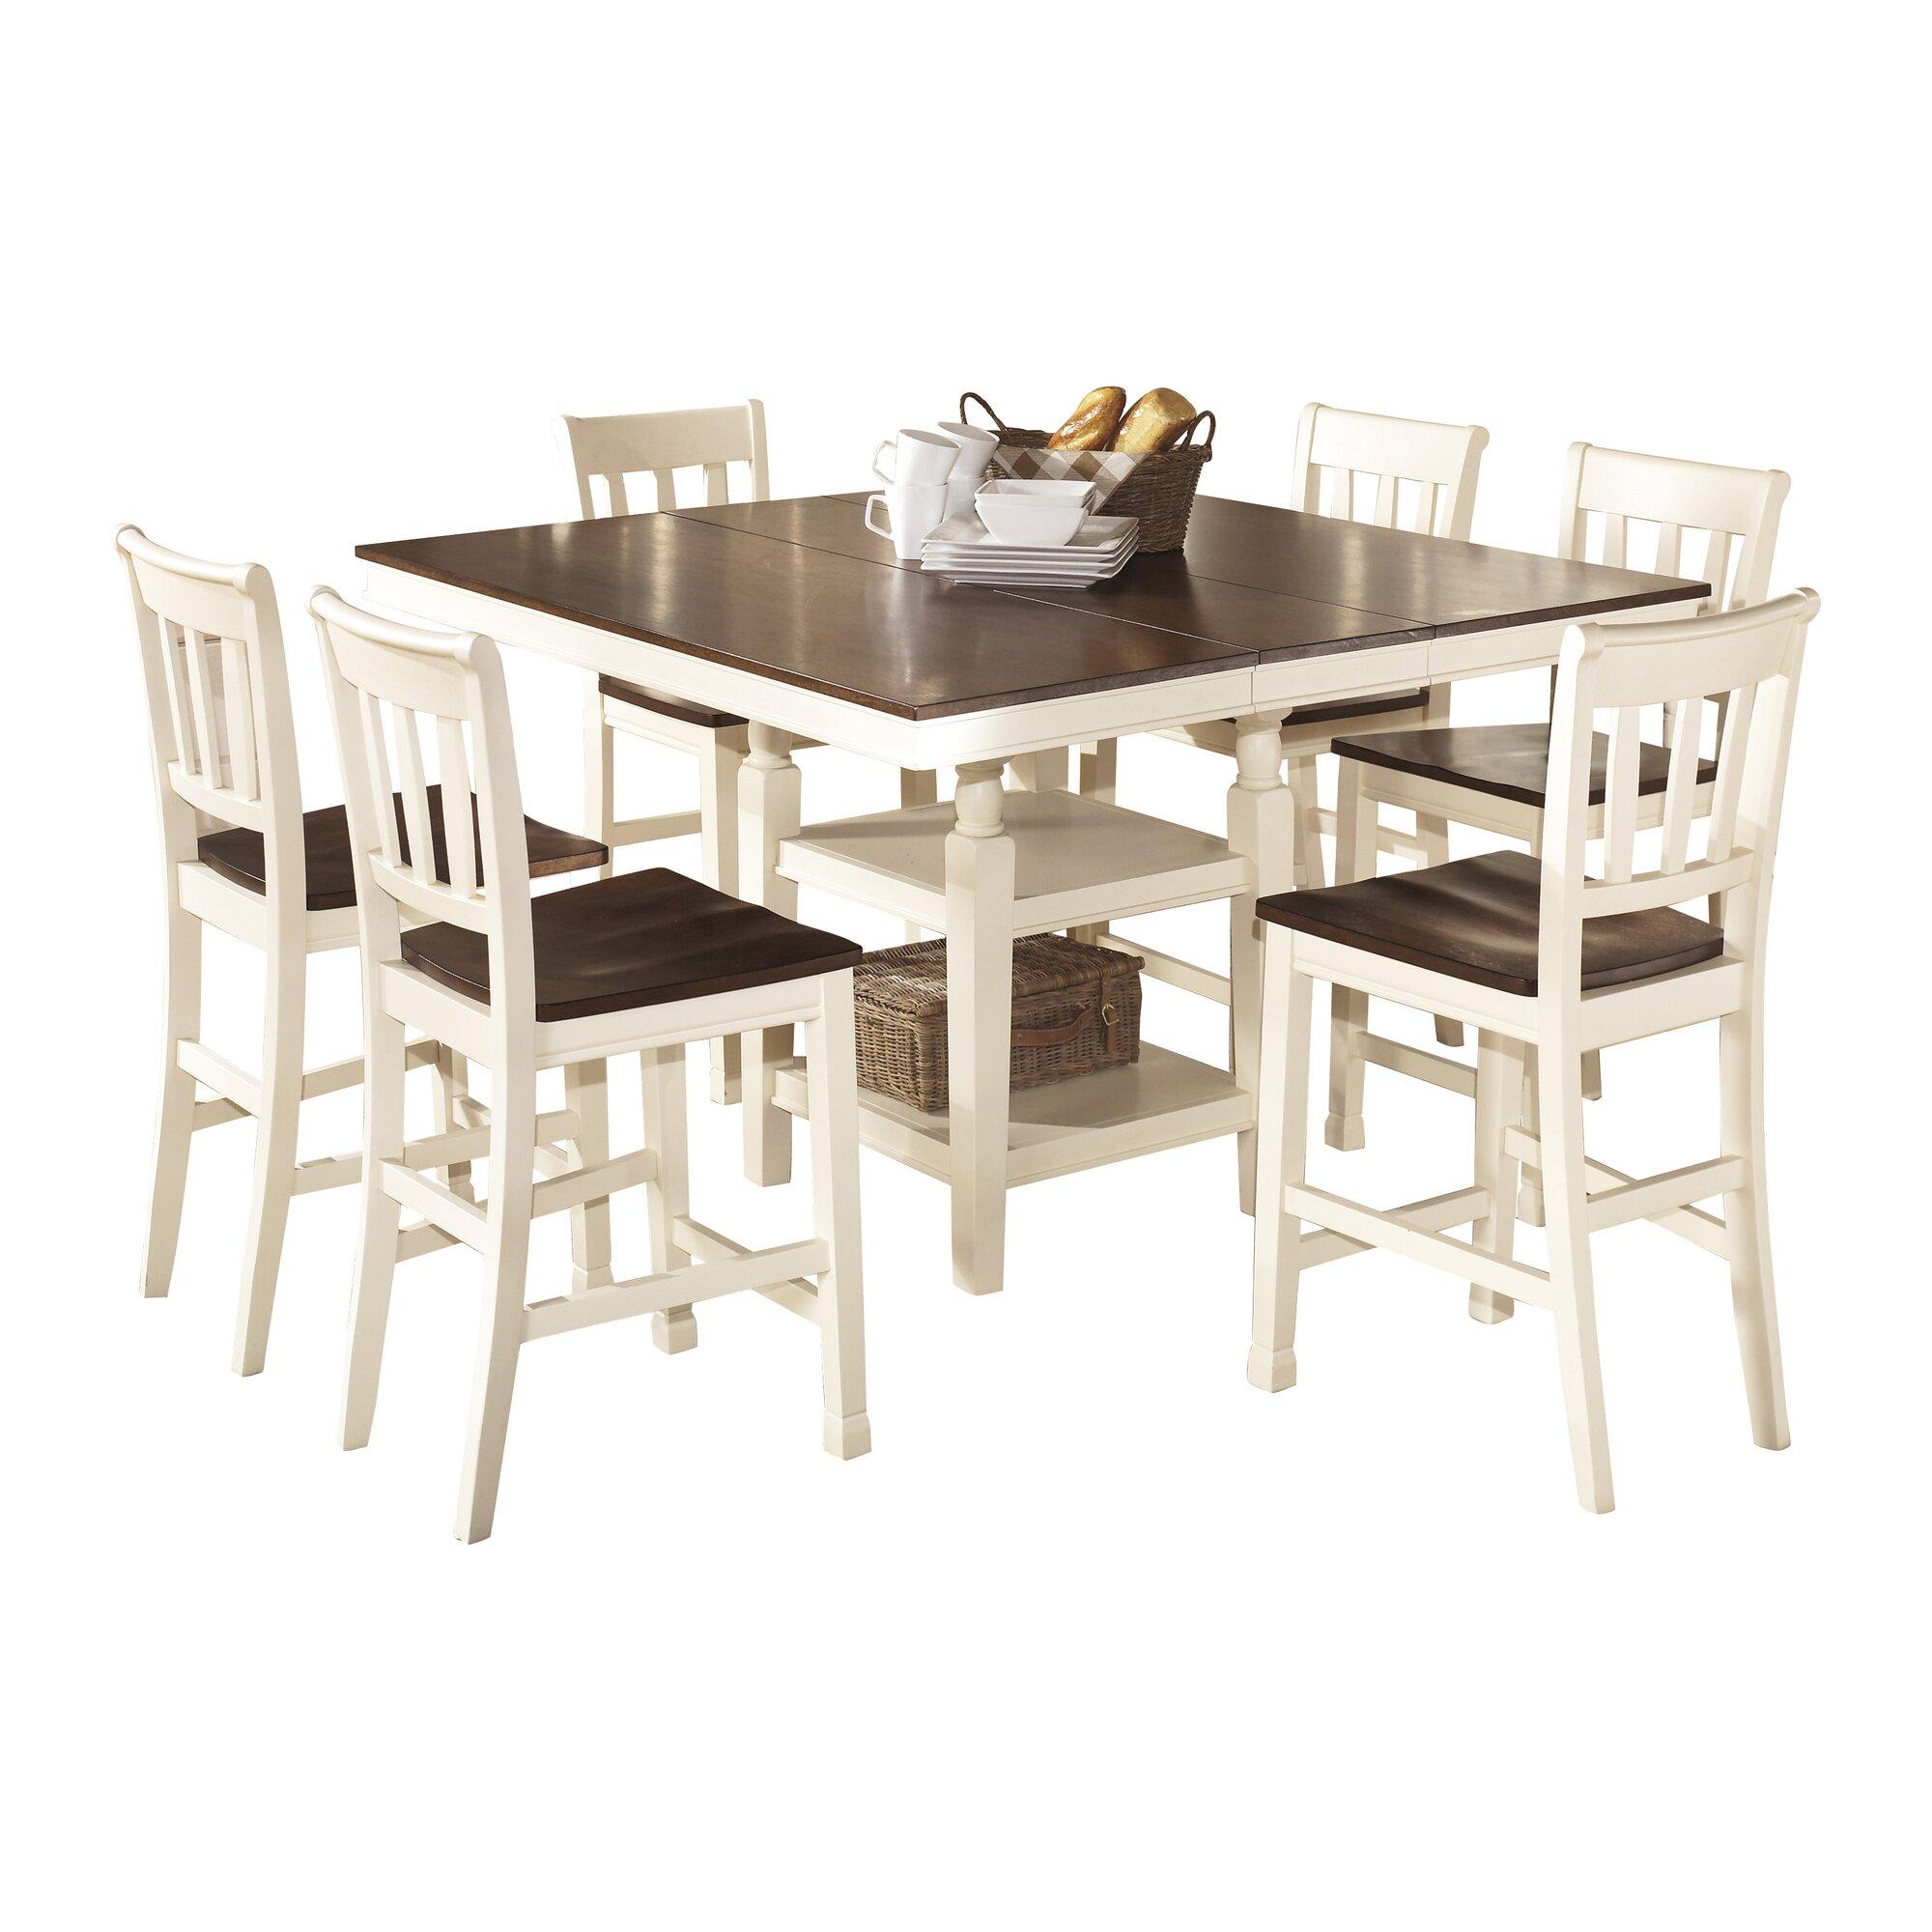 Beachcrest home magellan pub table reviews wayfair for Cie publication 85 table 2